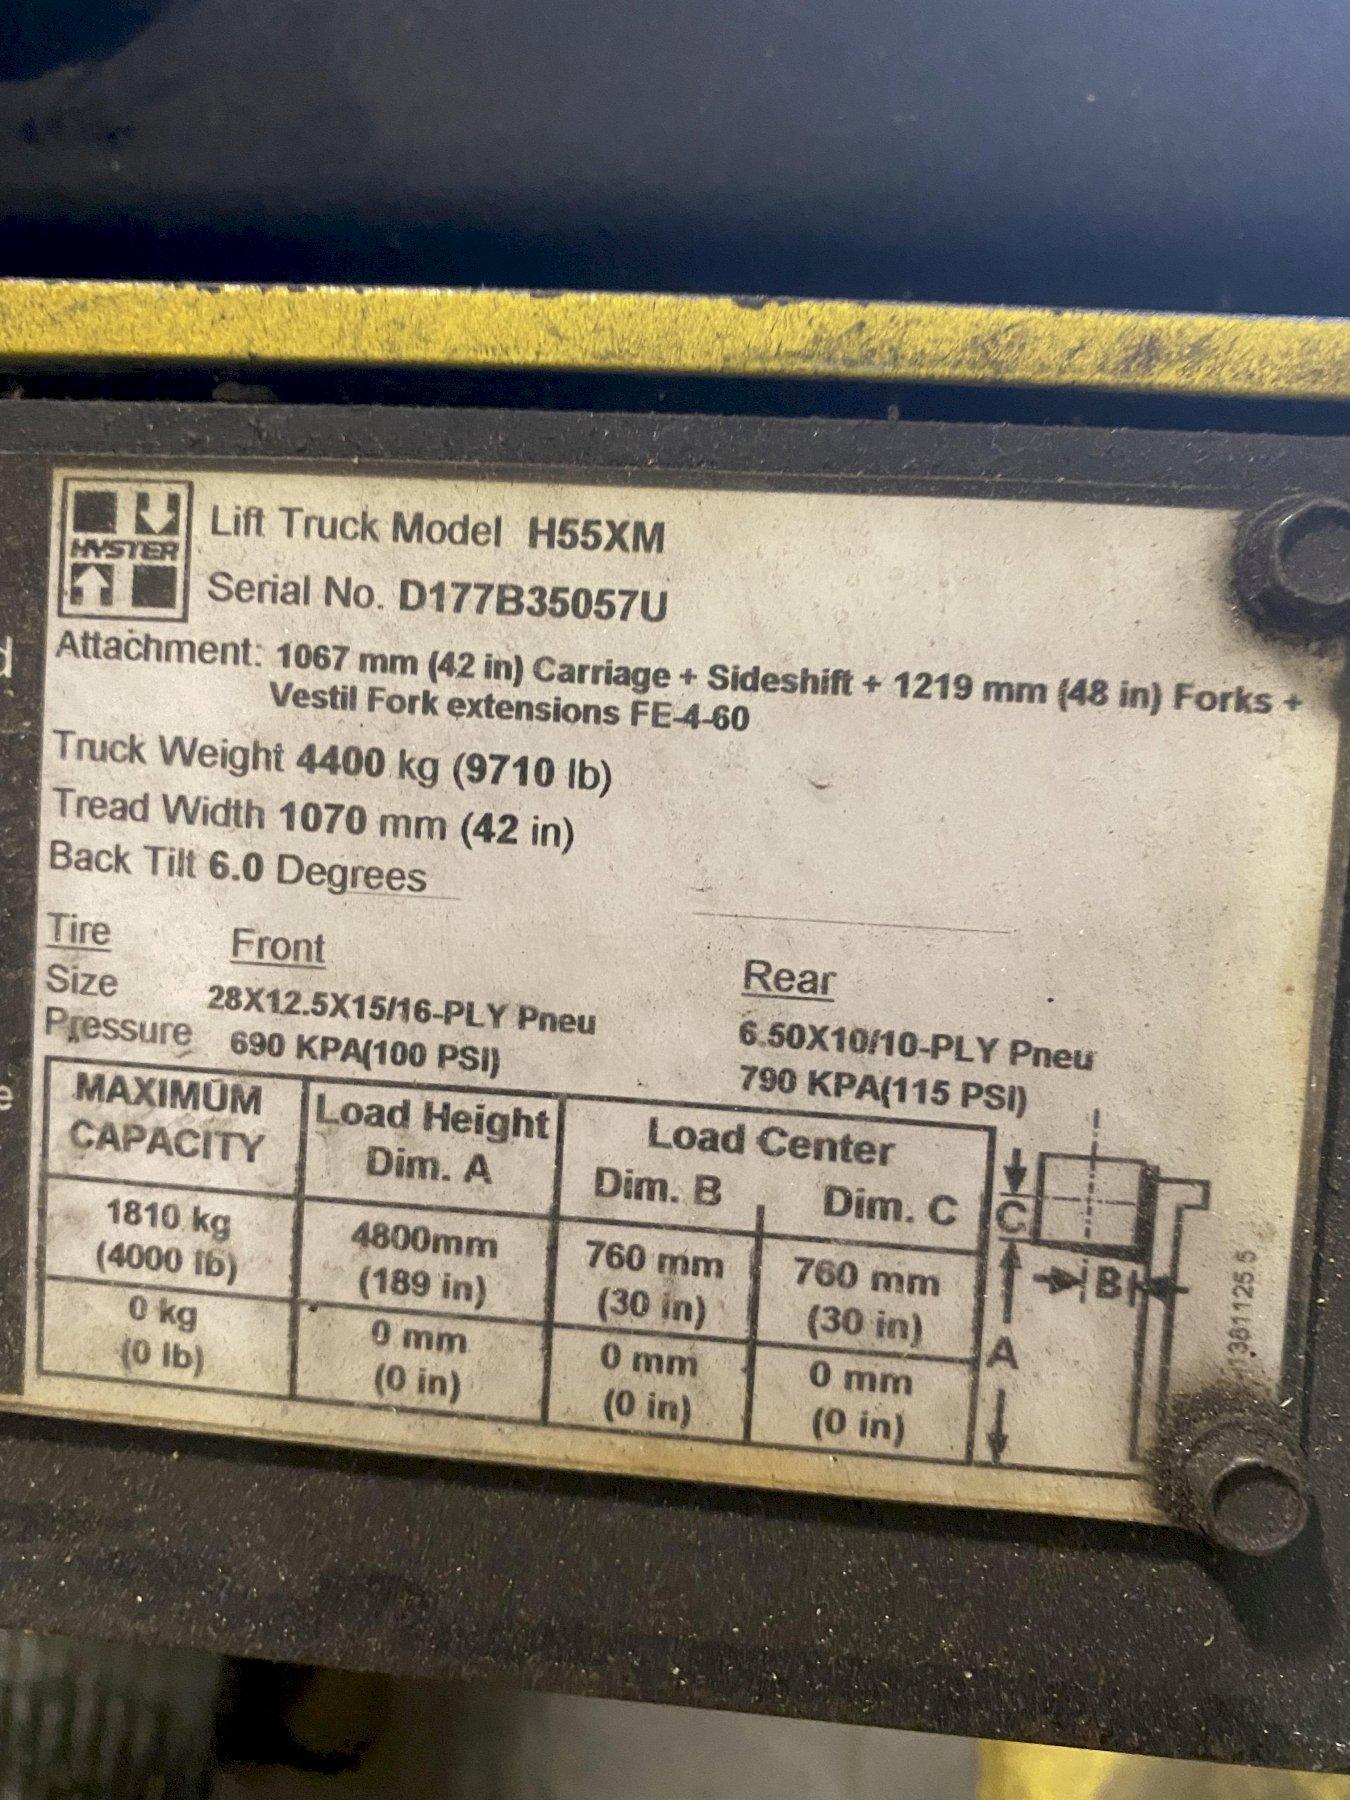 5,500 LB HYSTER H55XM PROPANE FORKLIFT. STOCK # 0847121